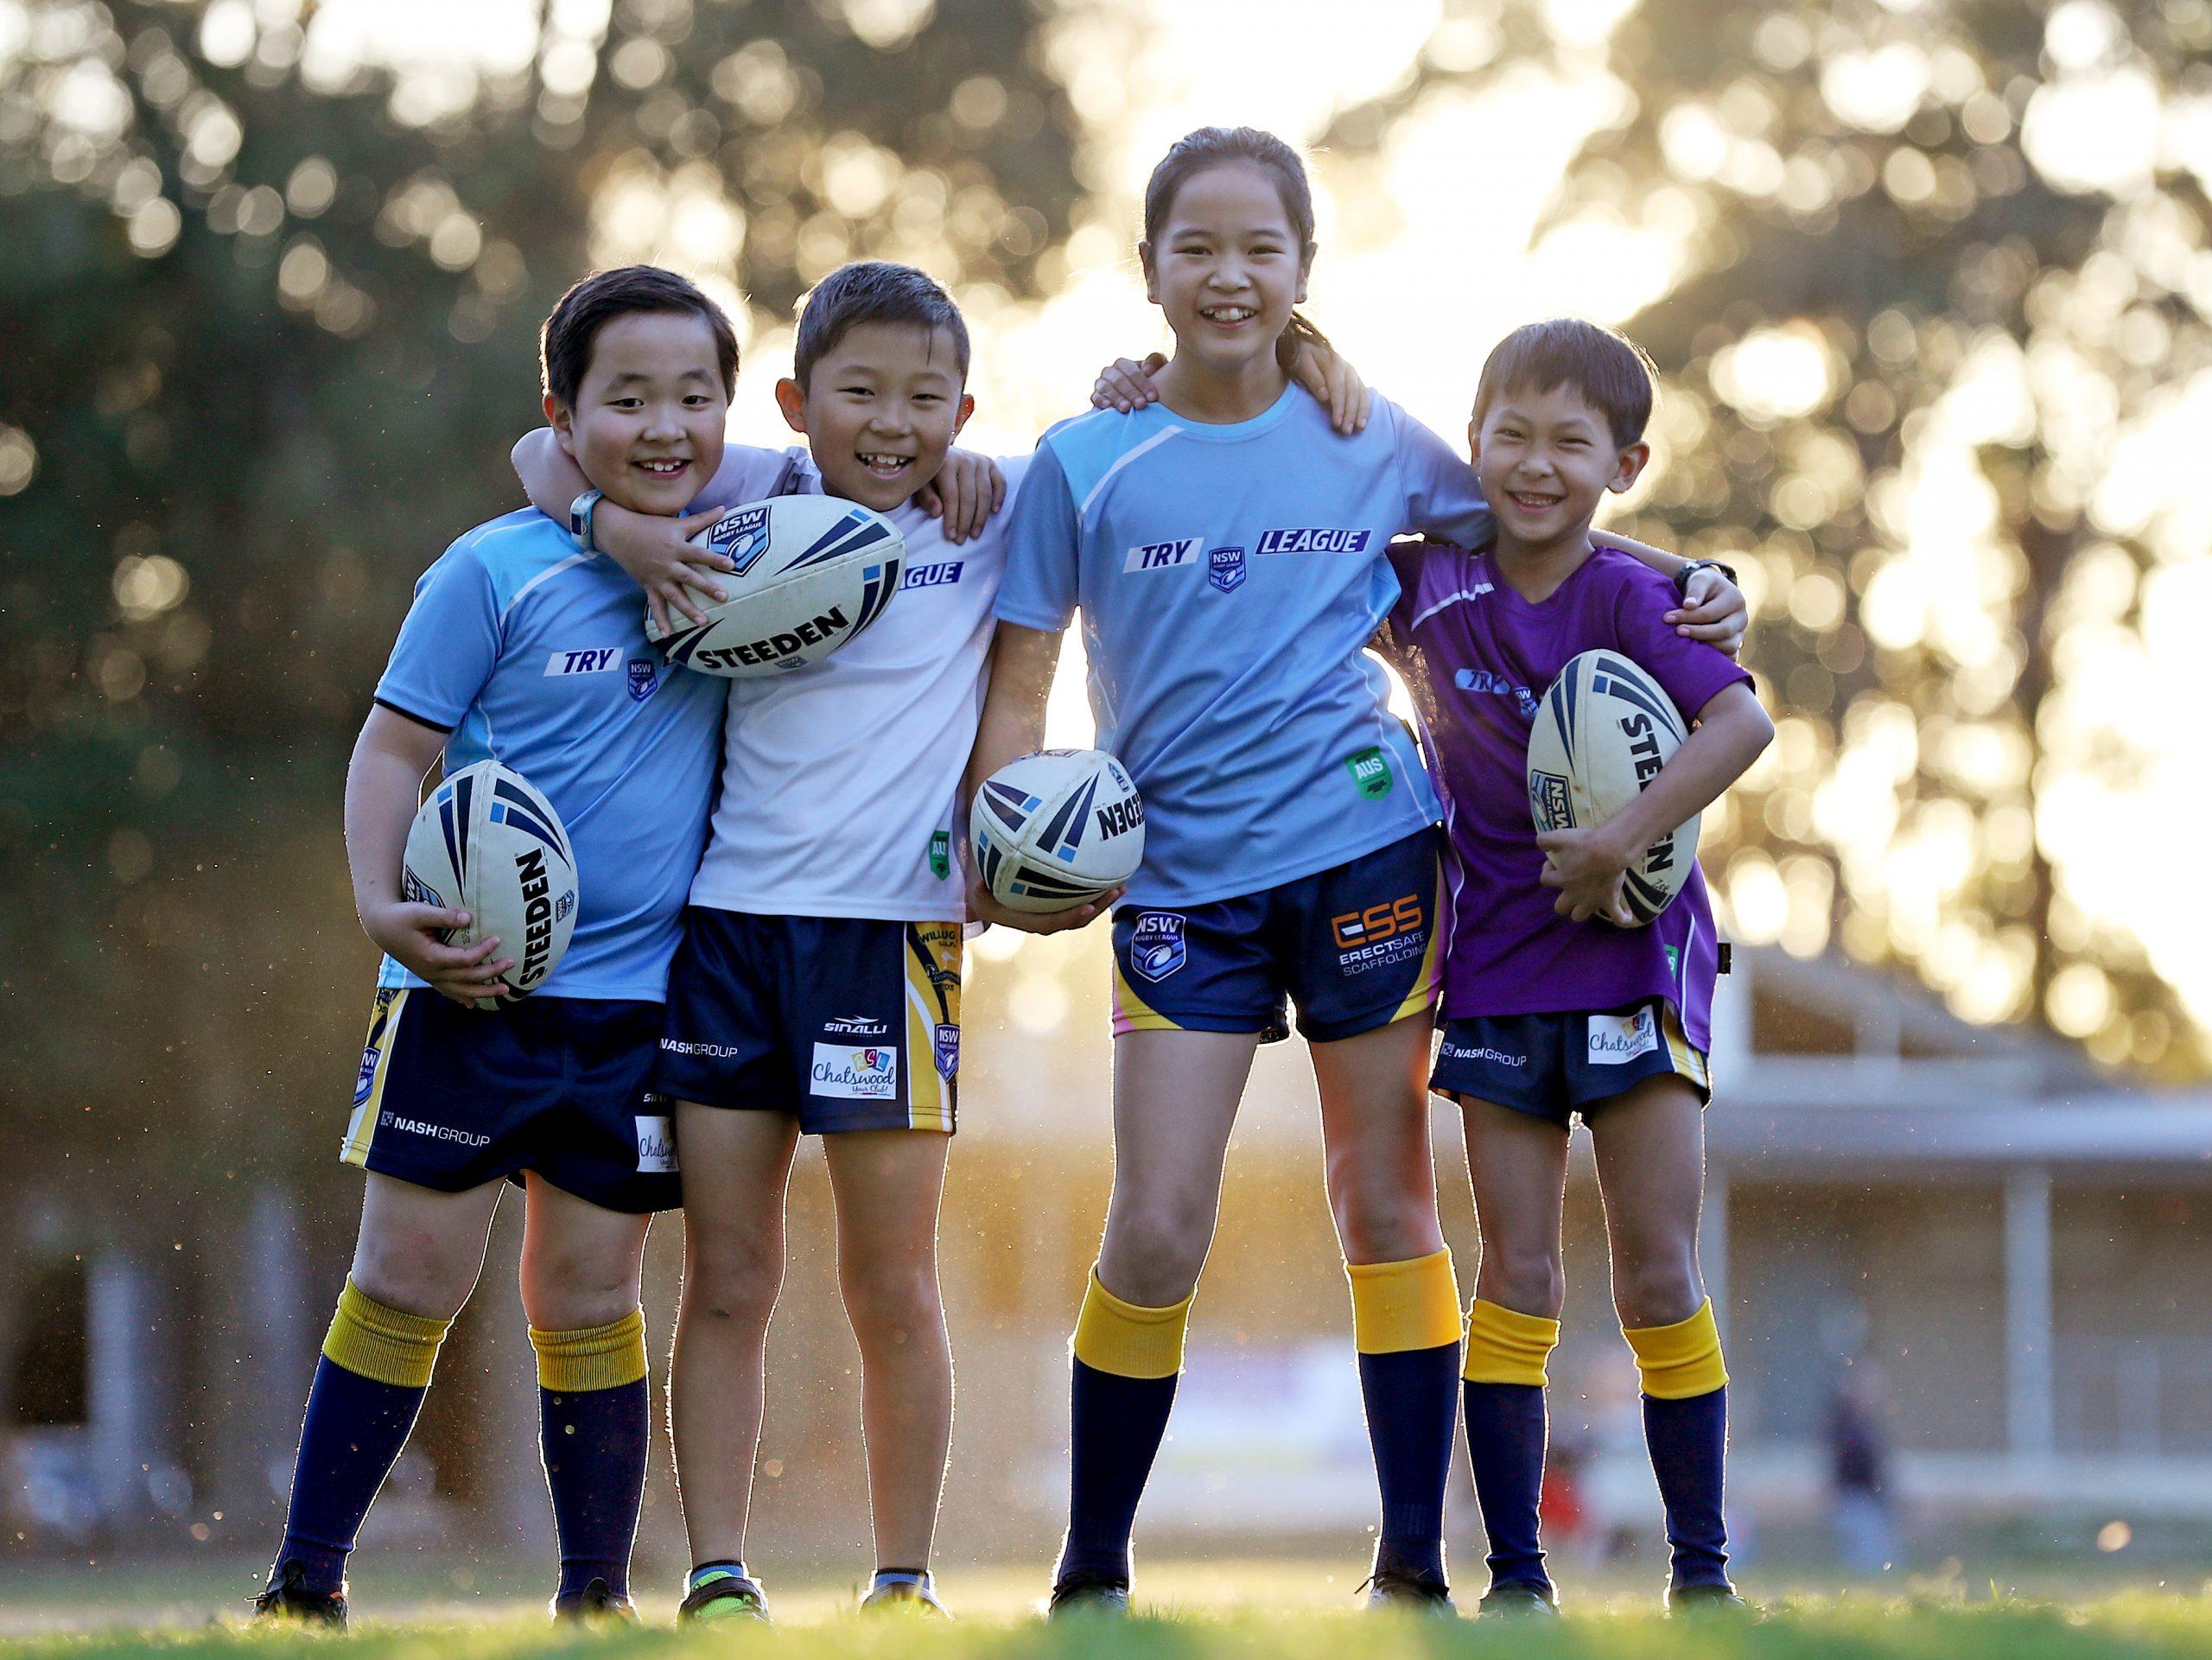 NSWRL celebrates birthday with record growth